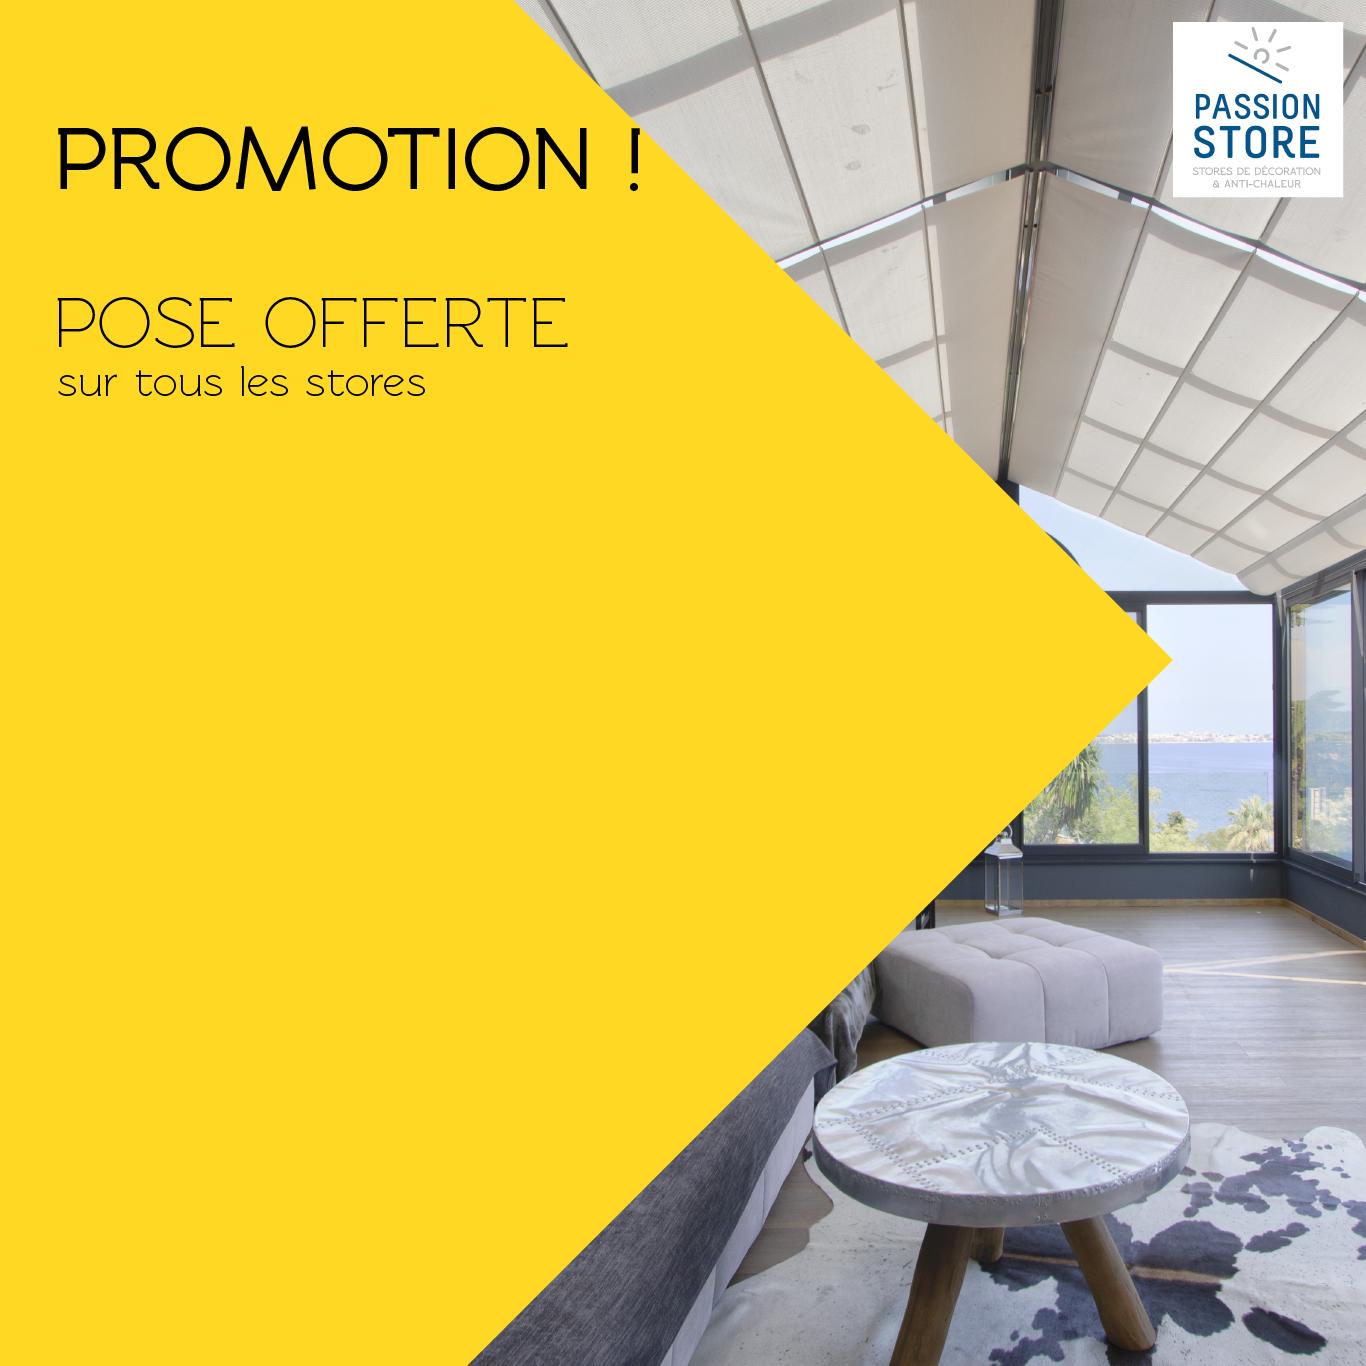 promotion pose offerte